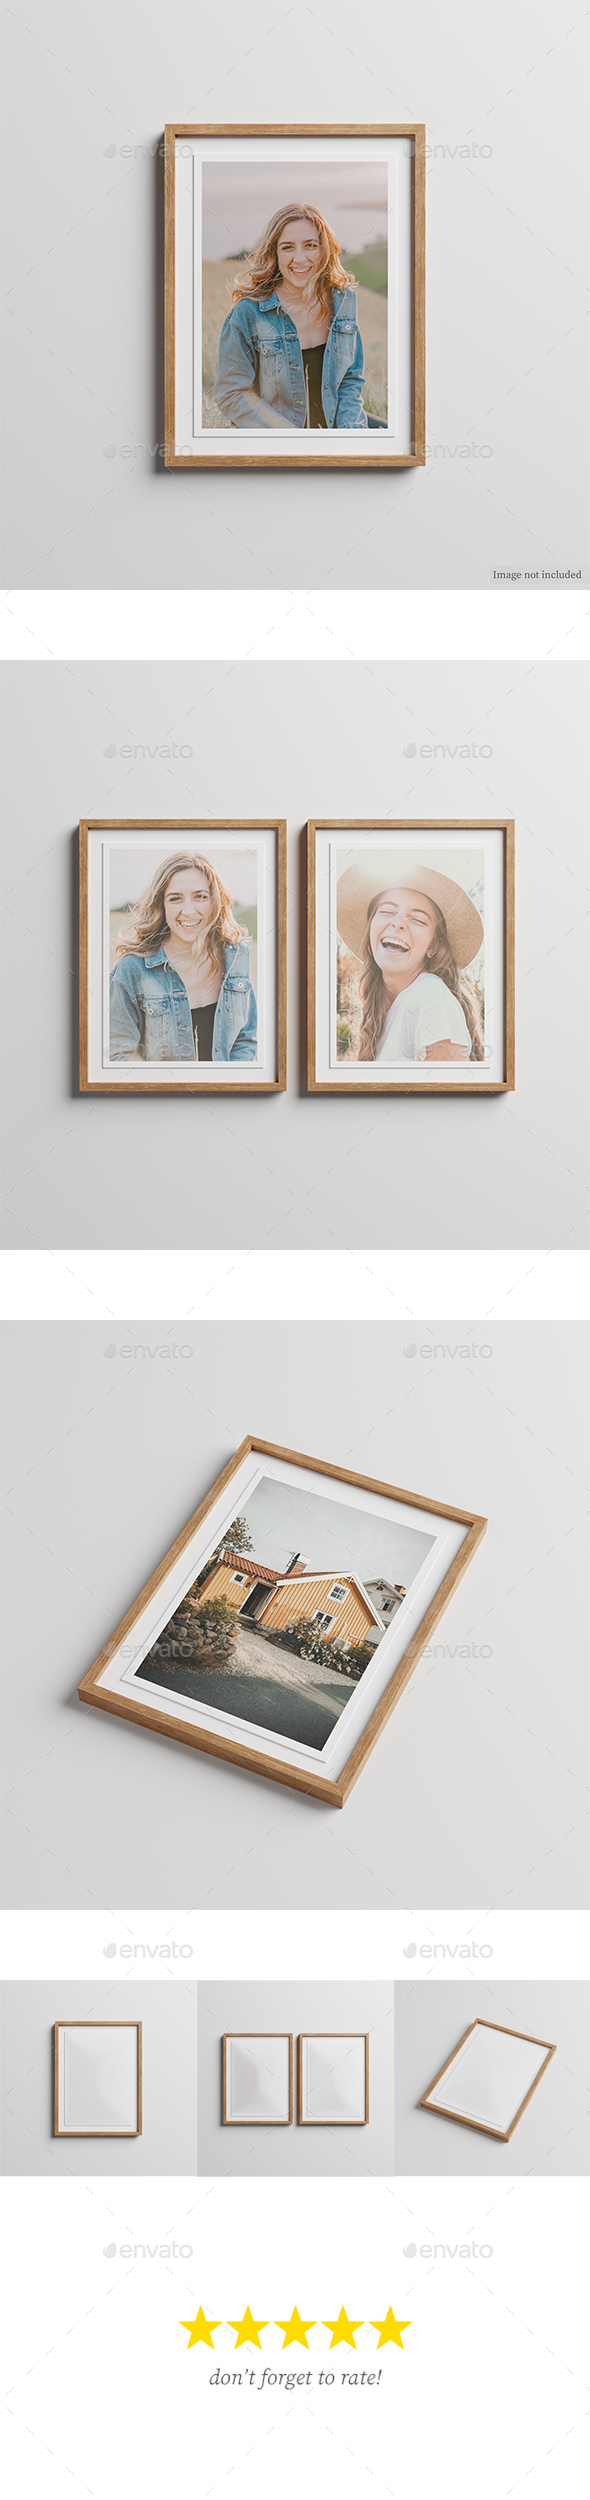 Wooden Frame Photos Mockup